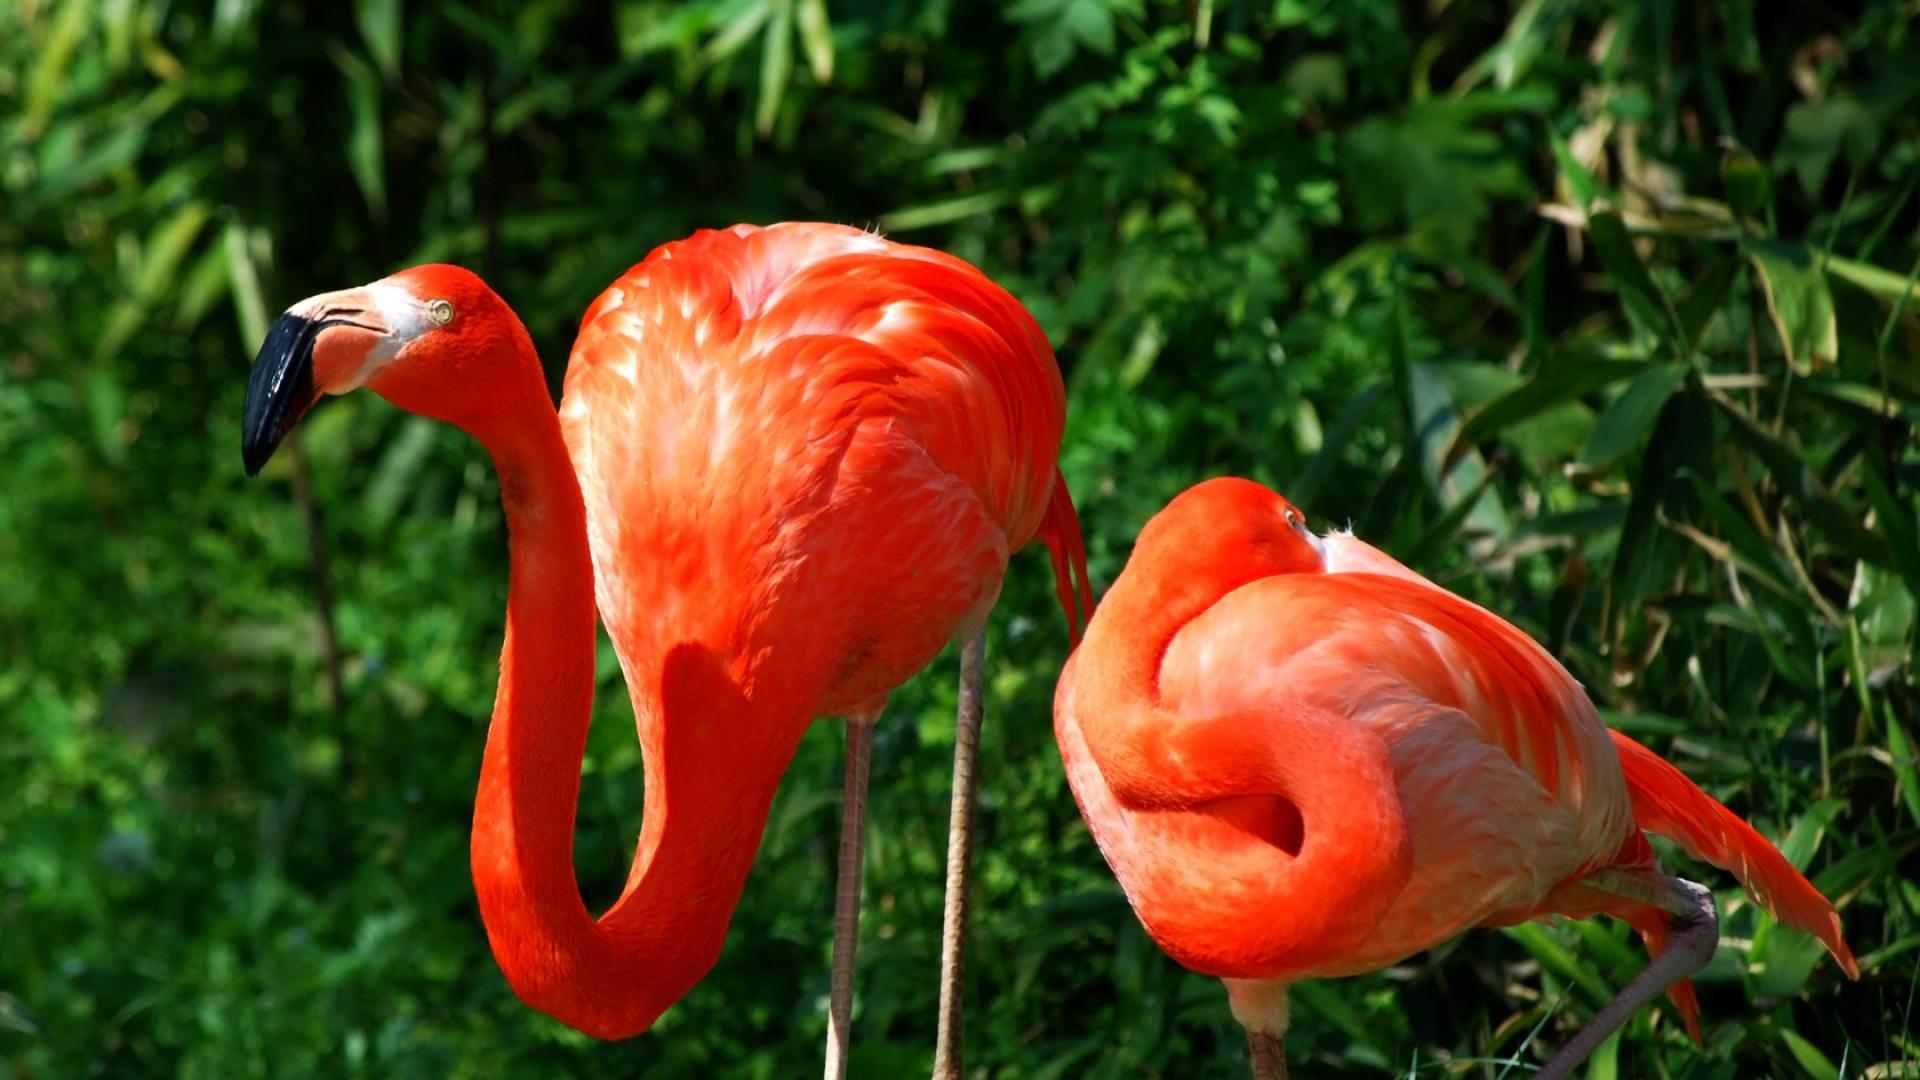 Download Wallpaper 1920x1080 Flamingo Couple Grass Birds Color